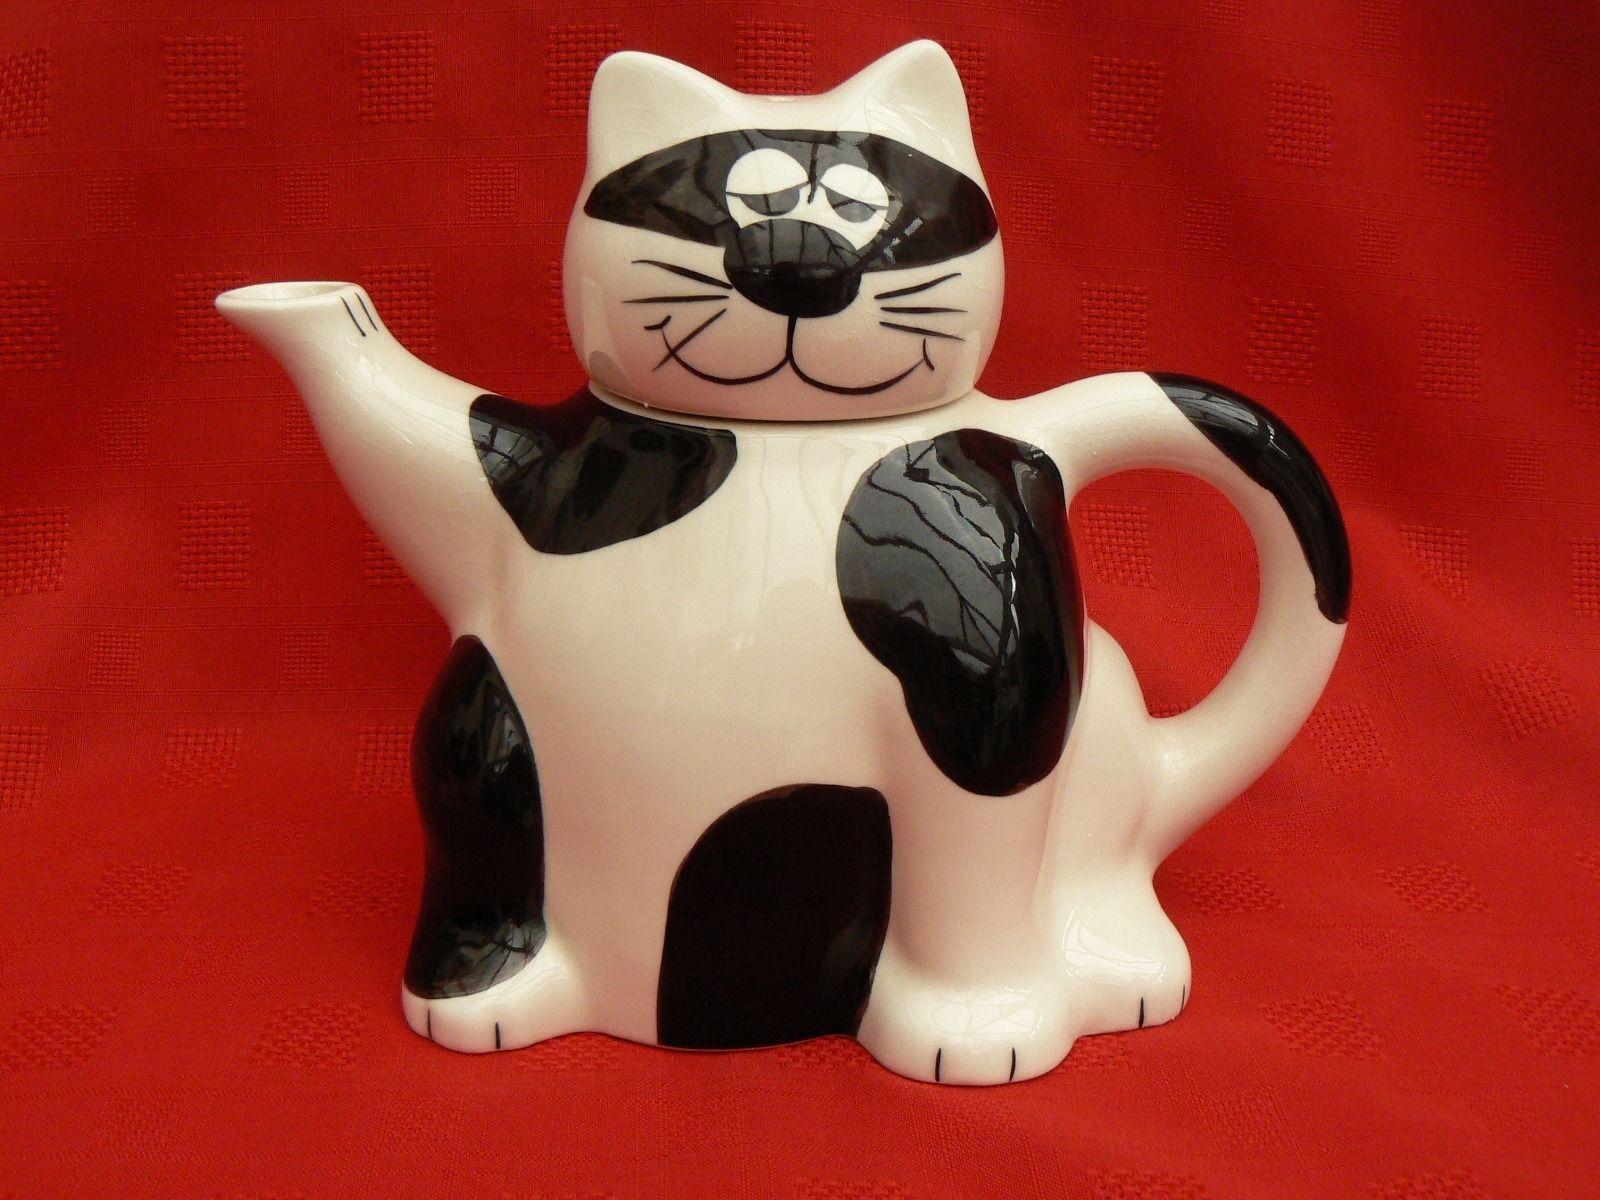 Whittard Cat Teapot Novelty Teapot Teapot